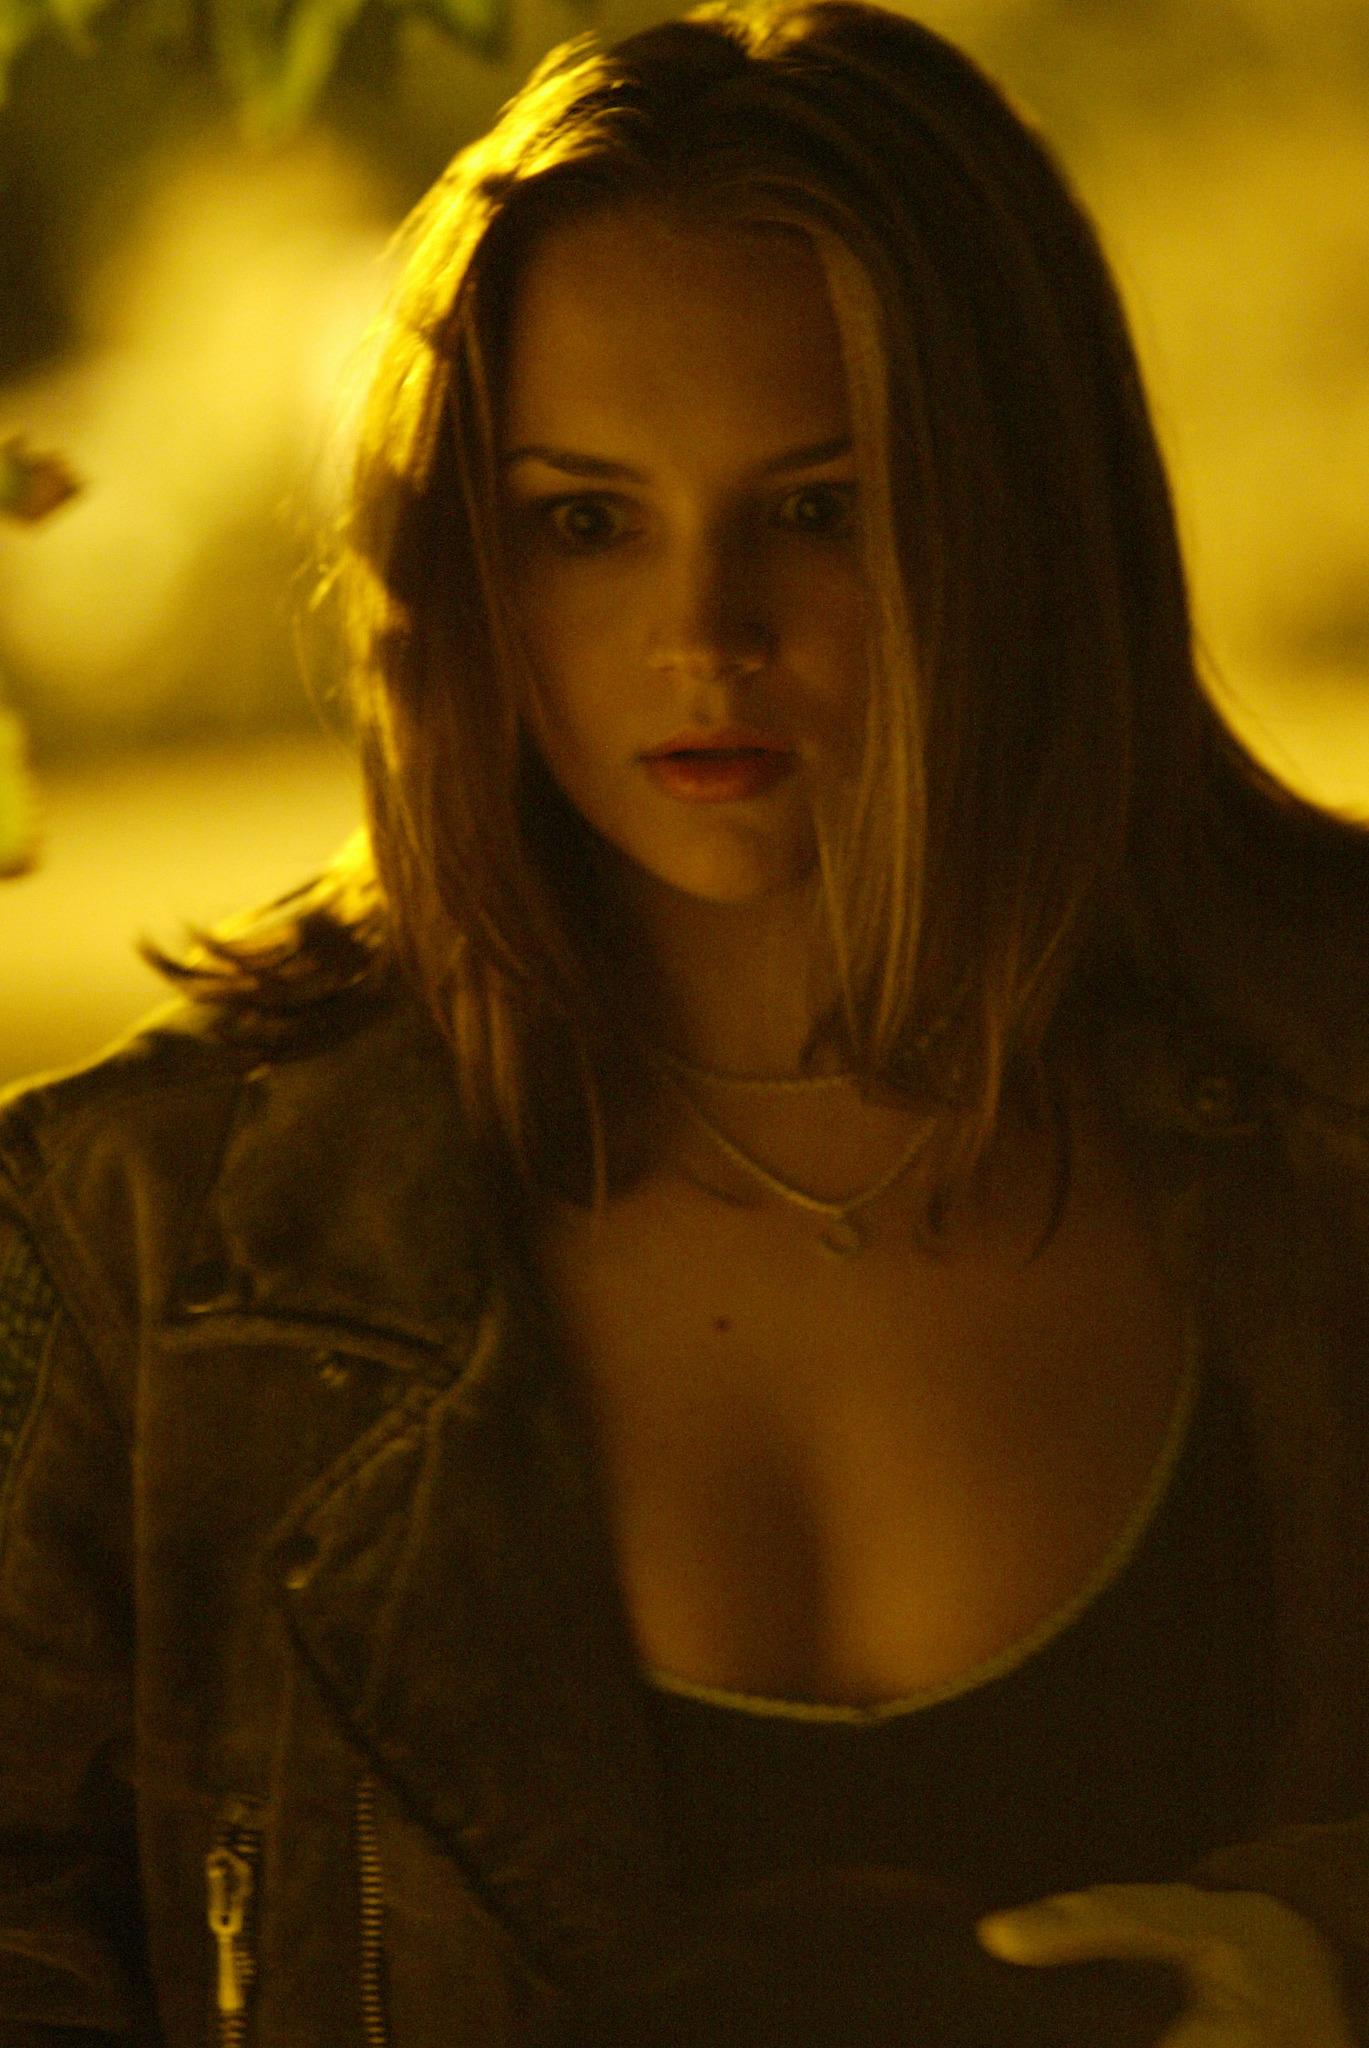 Rachael Leigh Cook in 11:14 (2003)